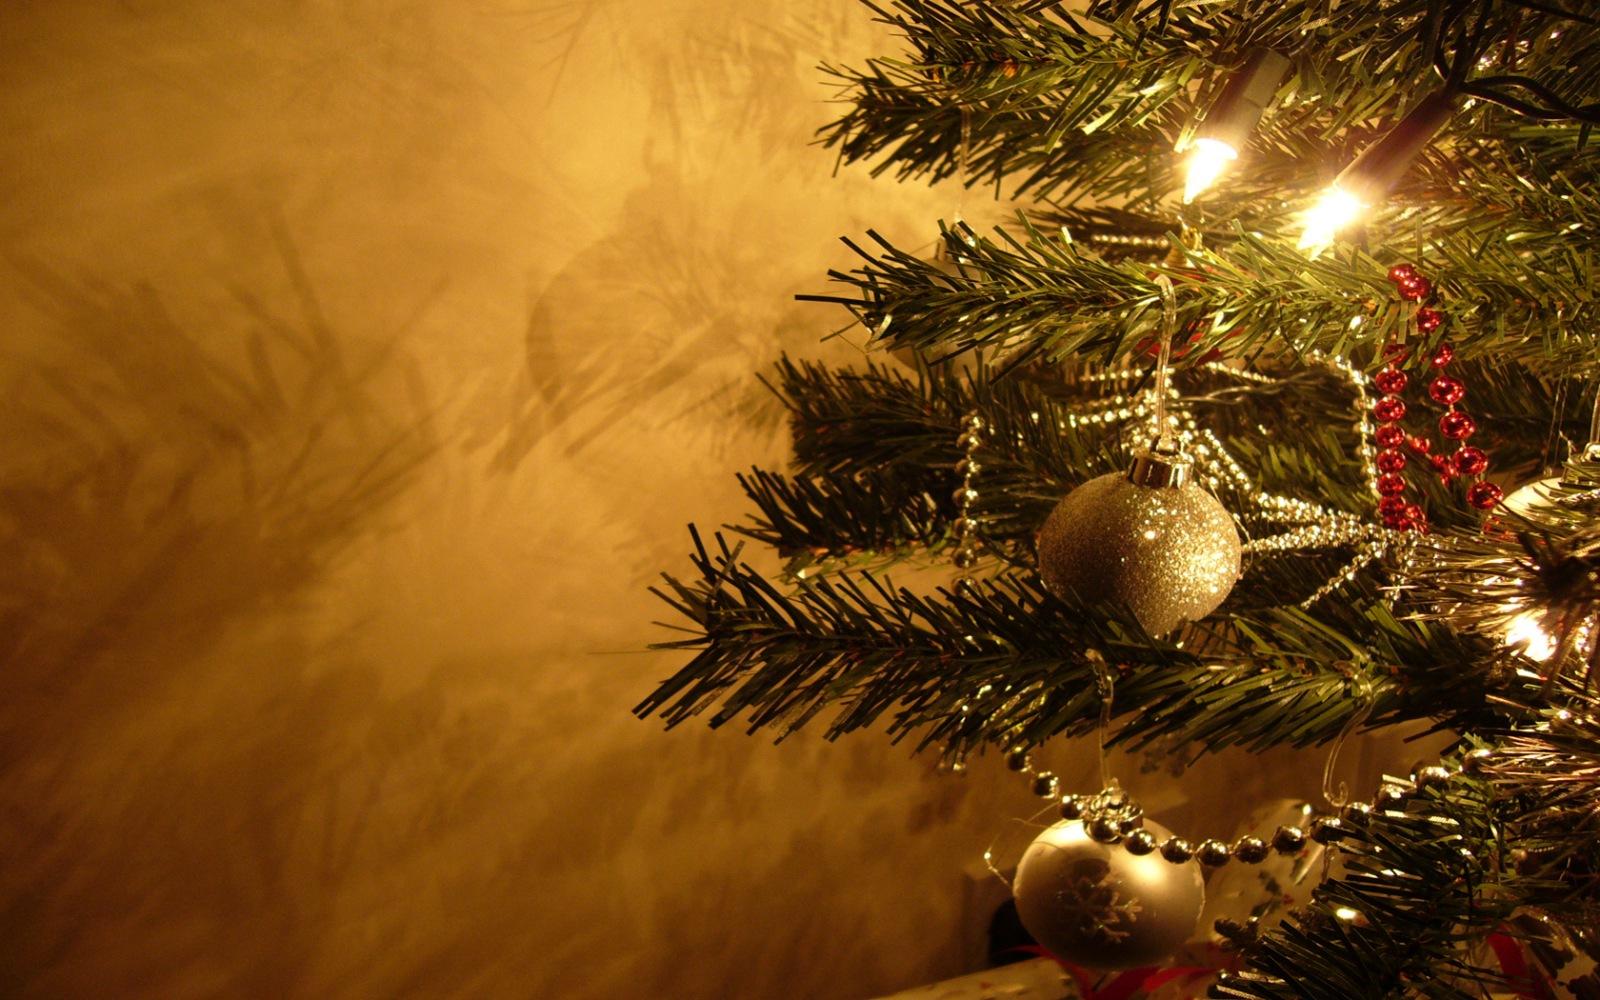 Christmas - Christmas Wallpaper Backgrounds Gold , HD Wallpaper & Backgrounds